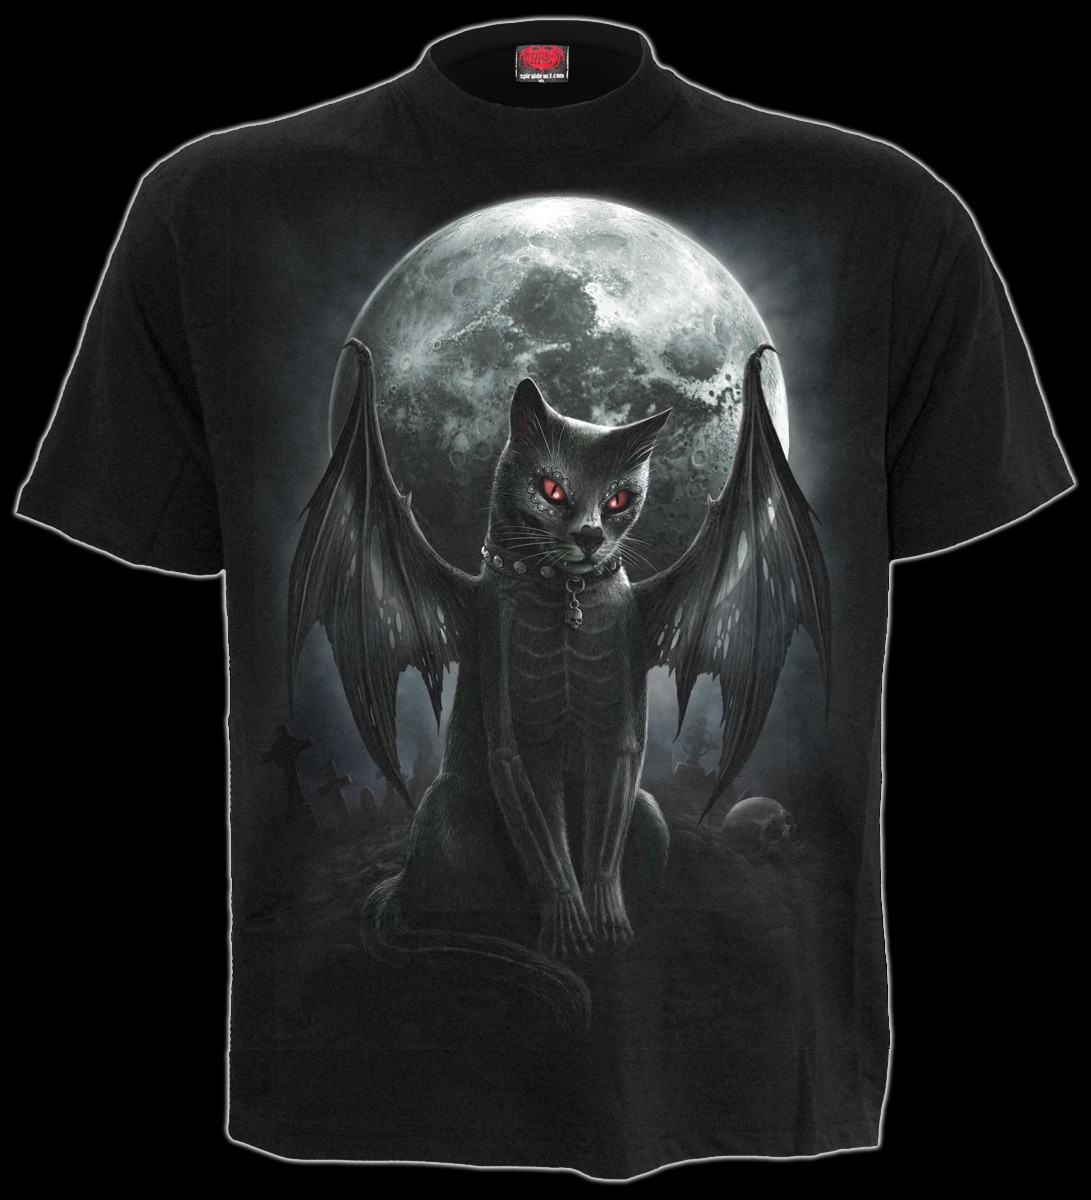 Spiral Gothic T-Shirt - Vamp Cat